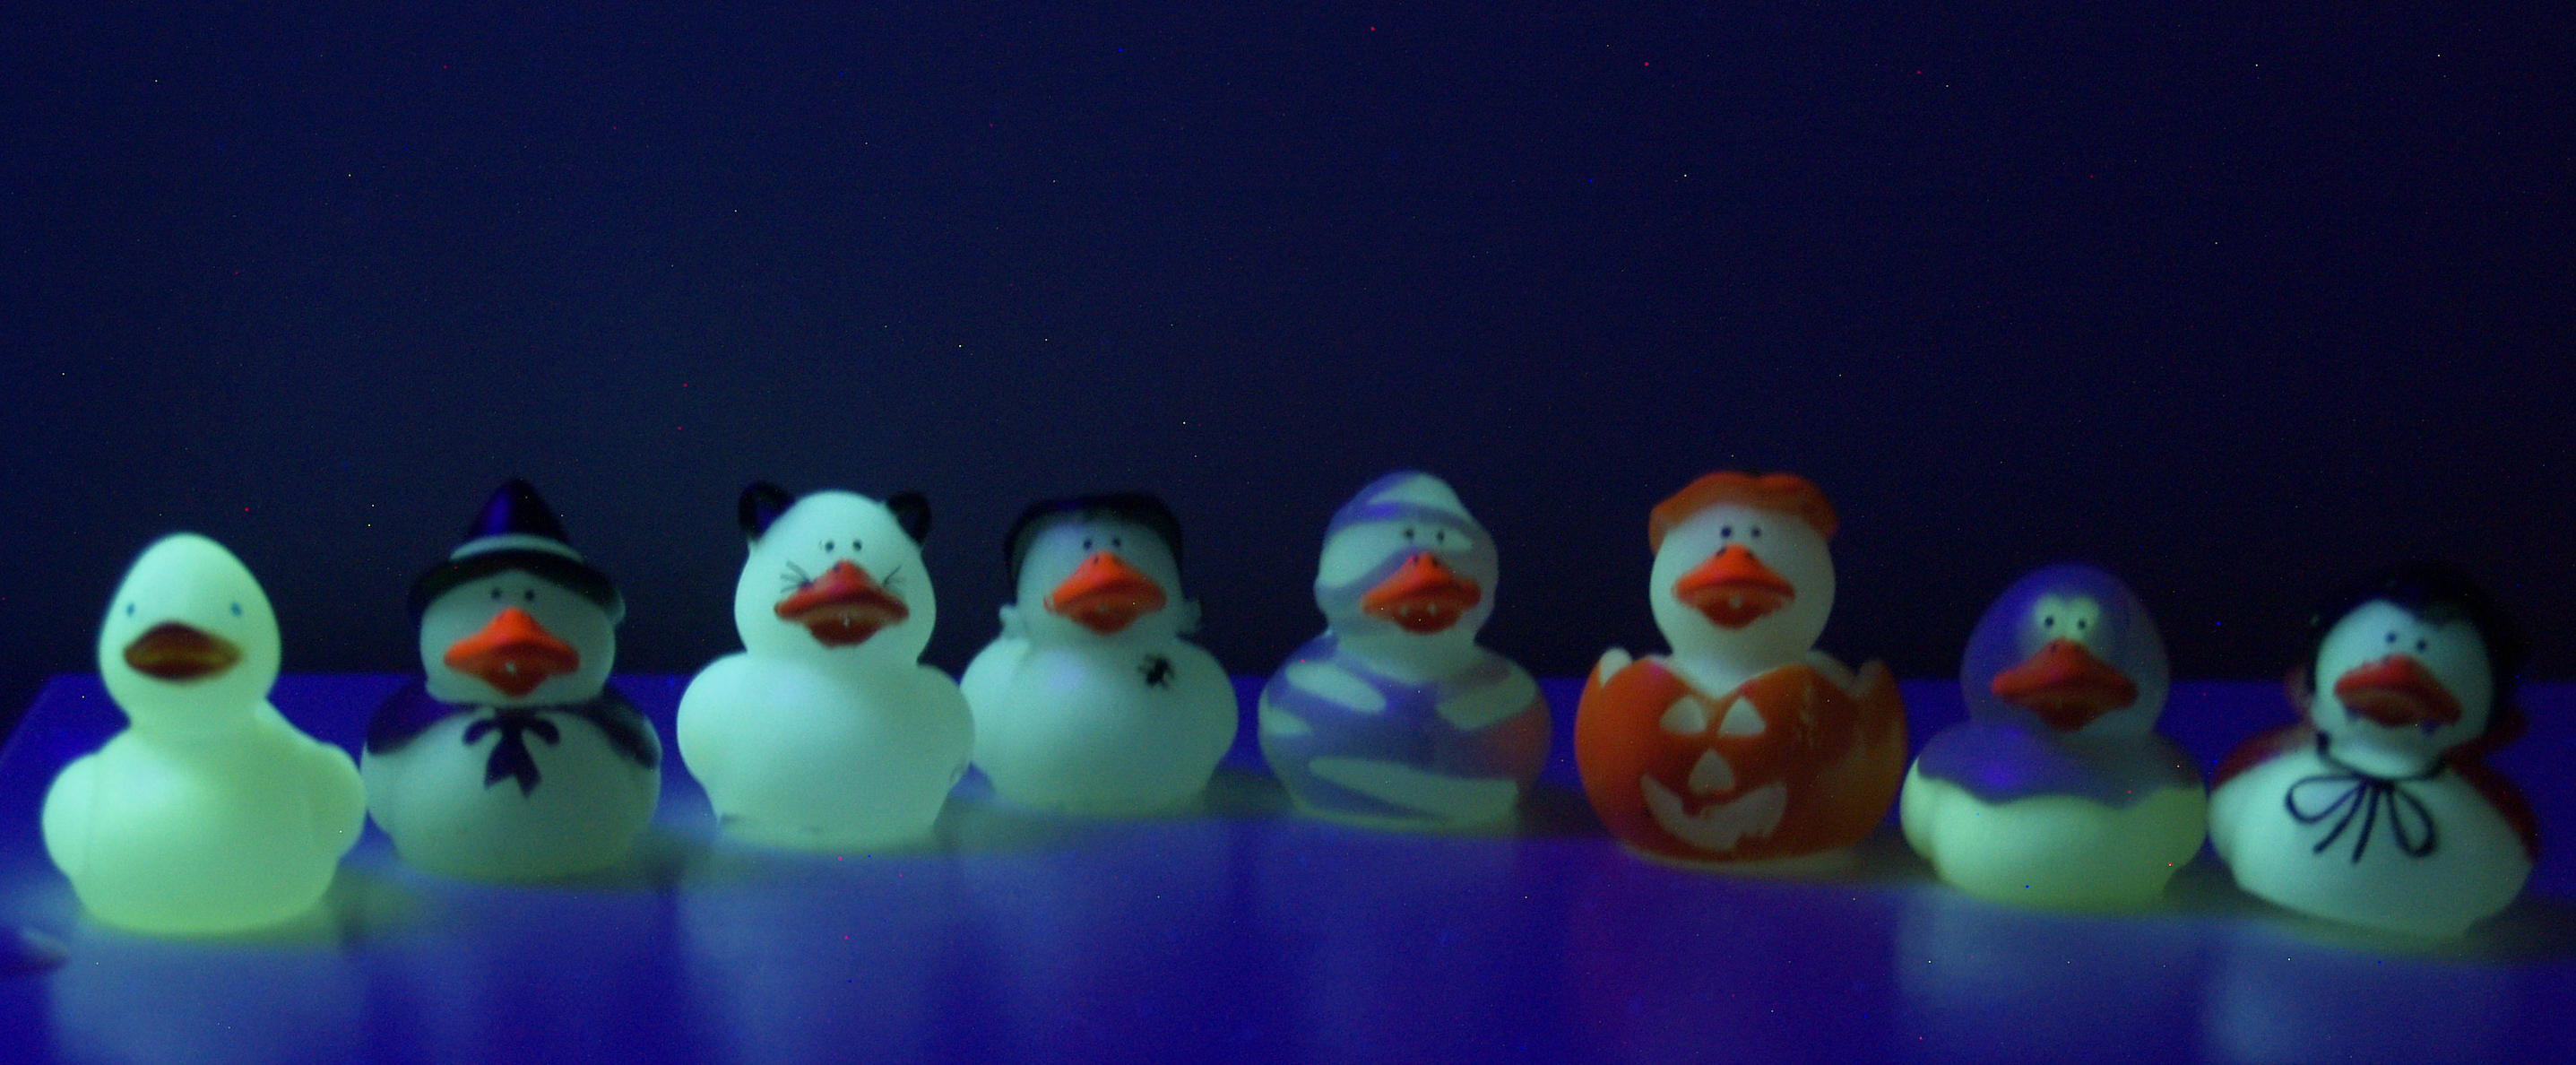 glowing quacks by Rebecca329